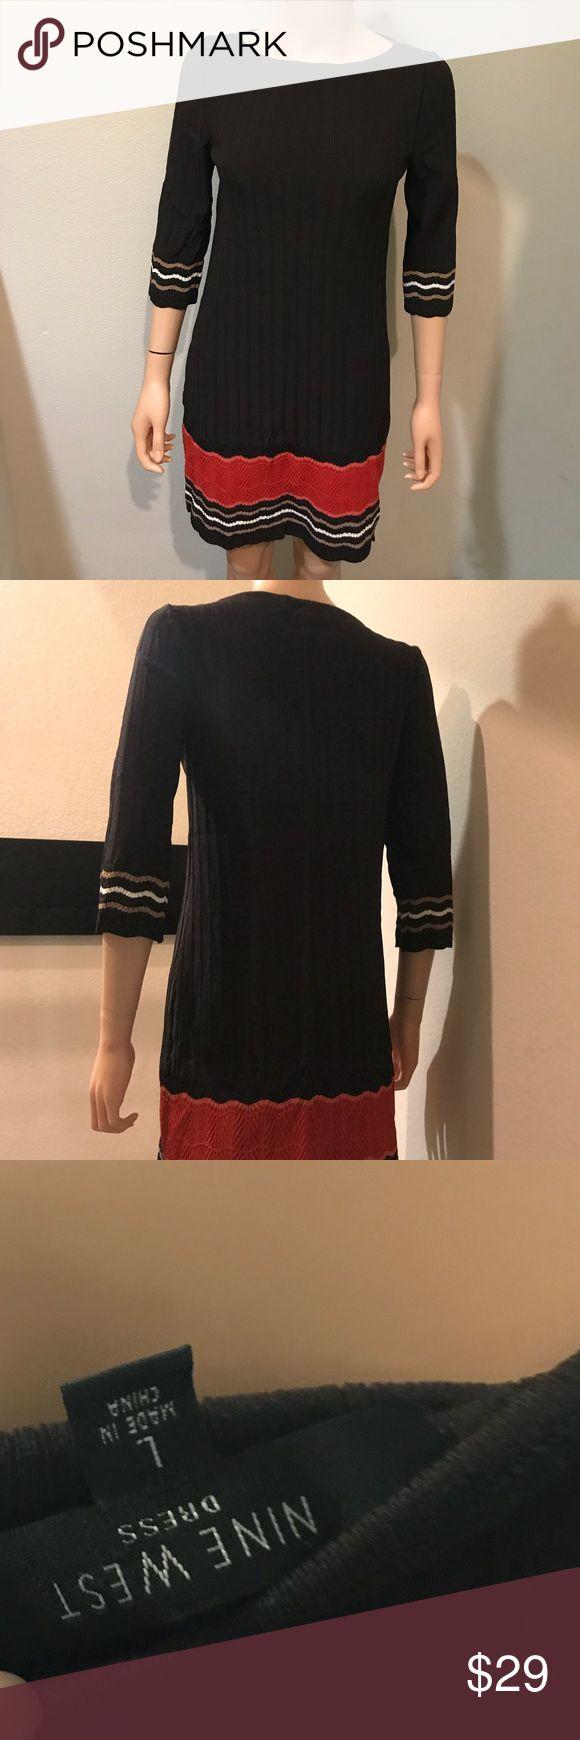 3/4 Sleeve Business Colorblock Dress Like New. 3/4 Sleeve Business Colorblock Dress. Black/Red/White Size L Nine West Dresses Midi